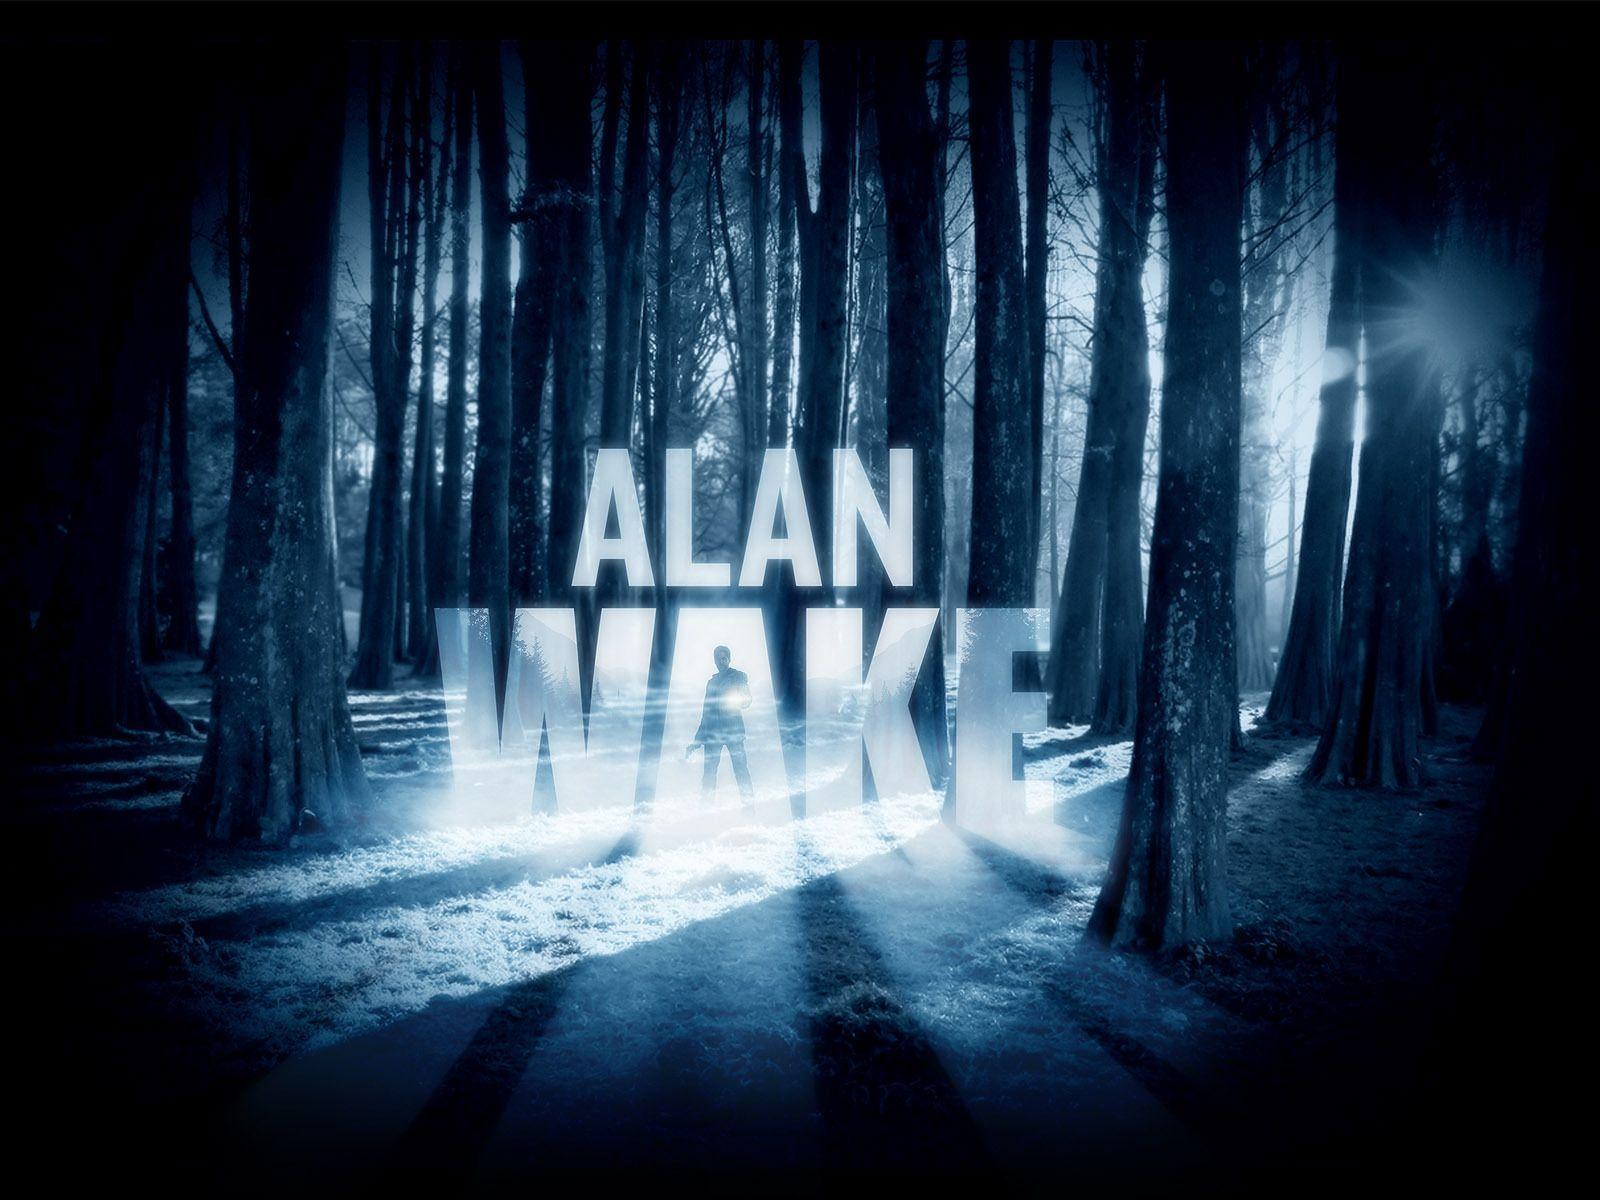 Alan Wake Wallpapers 1600x1200